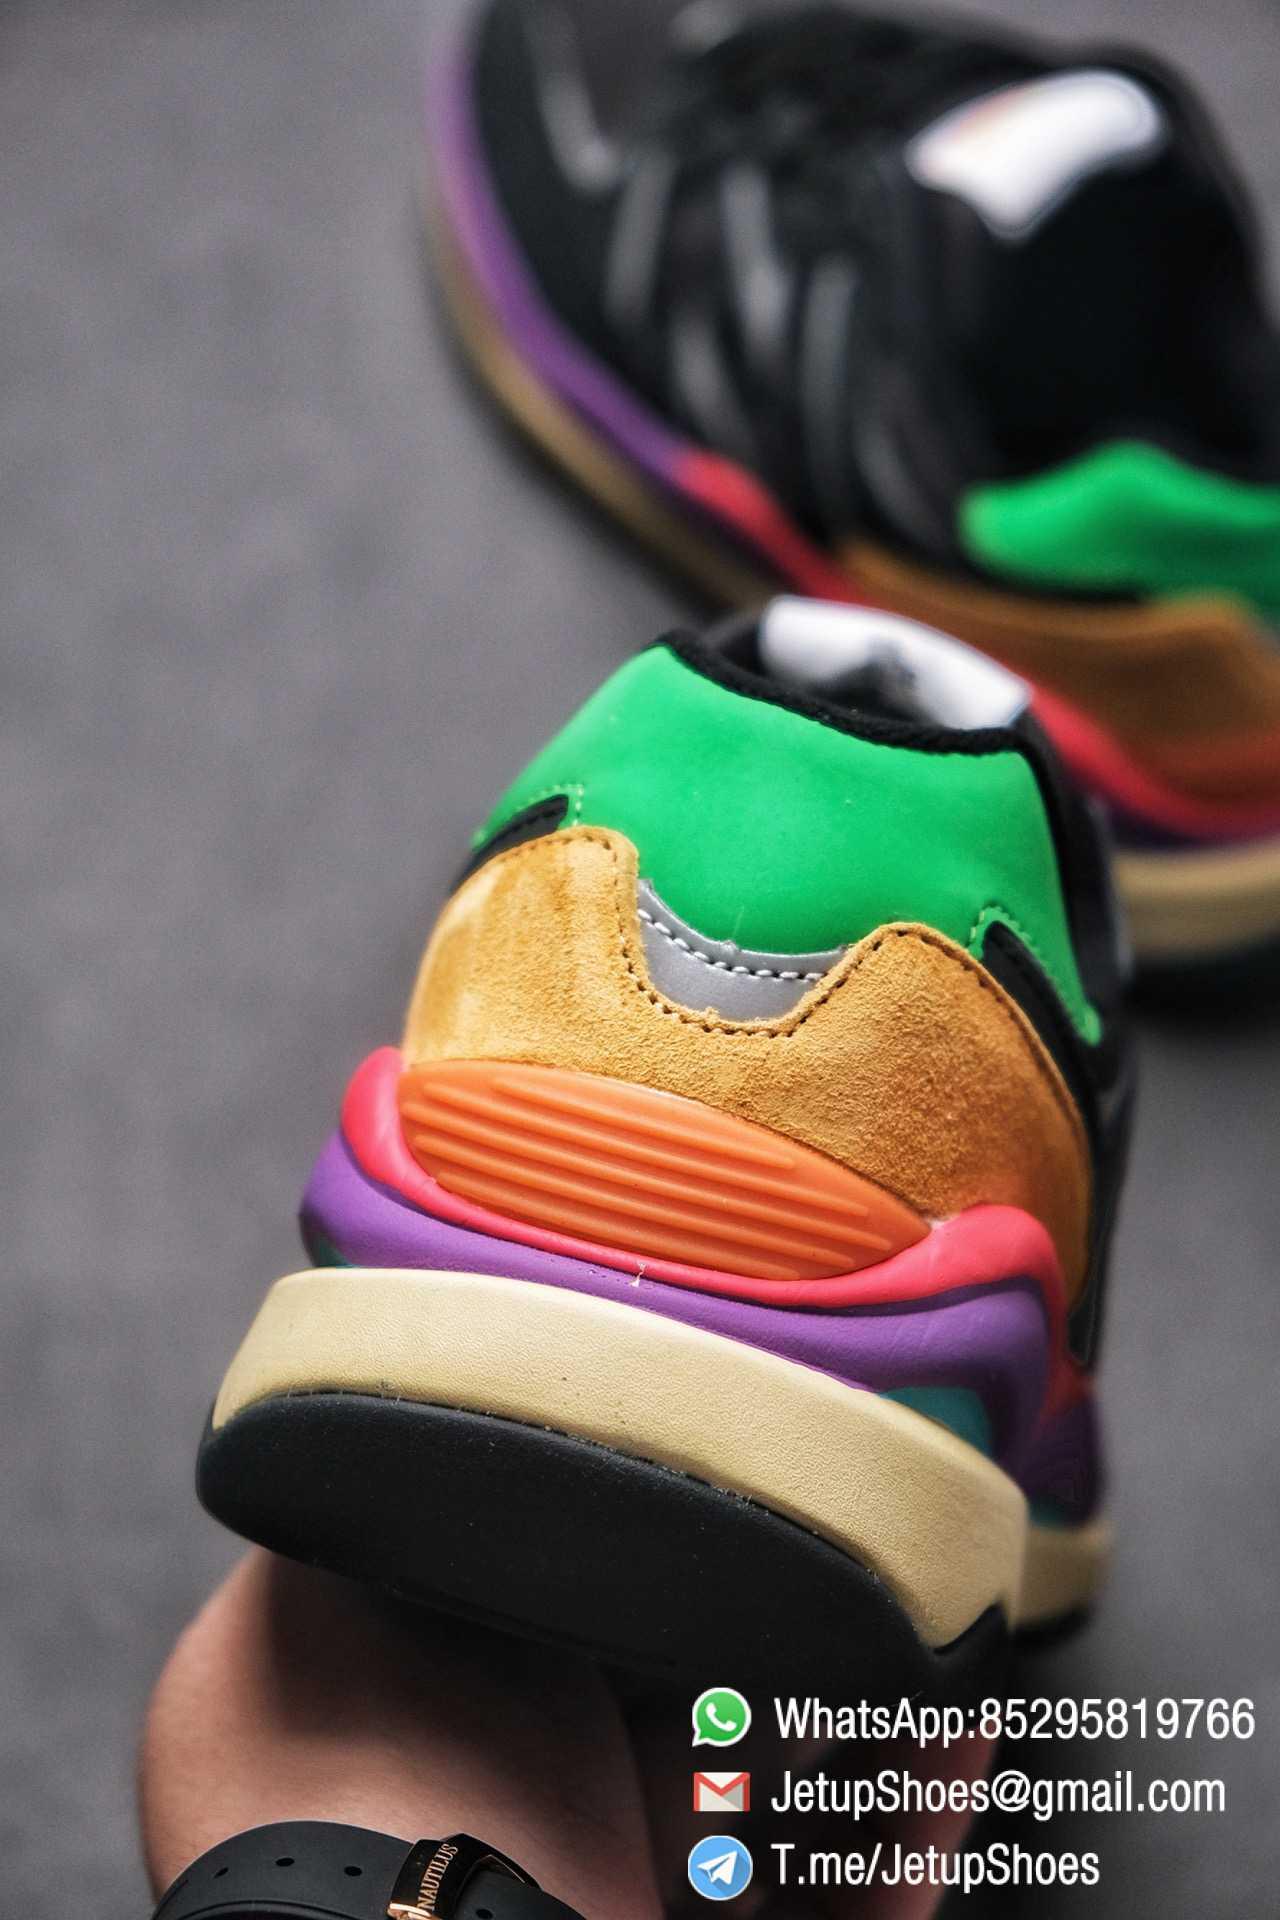 New Balance 5740 Black Multicolor Running Sneakers M5740LB Black Mesh Upper Oriange Suede Oversized N 08